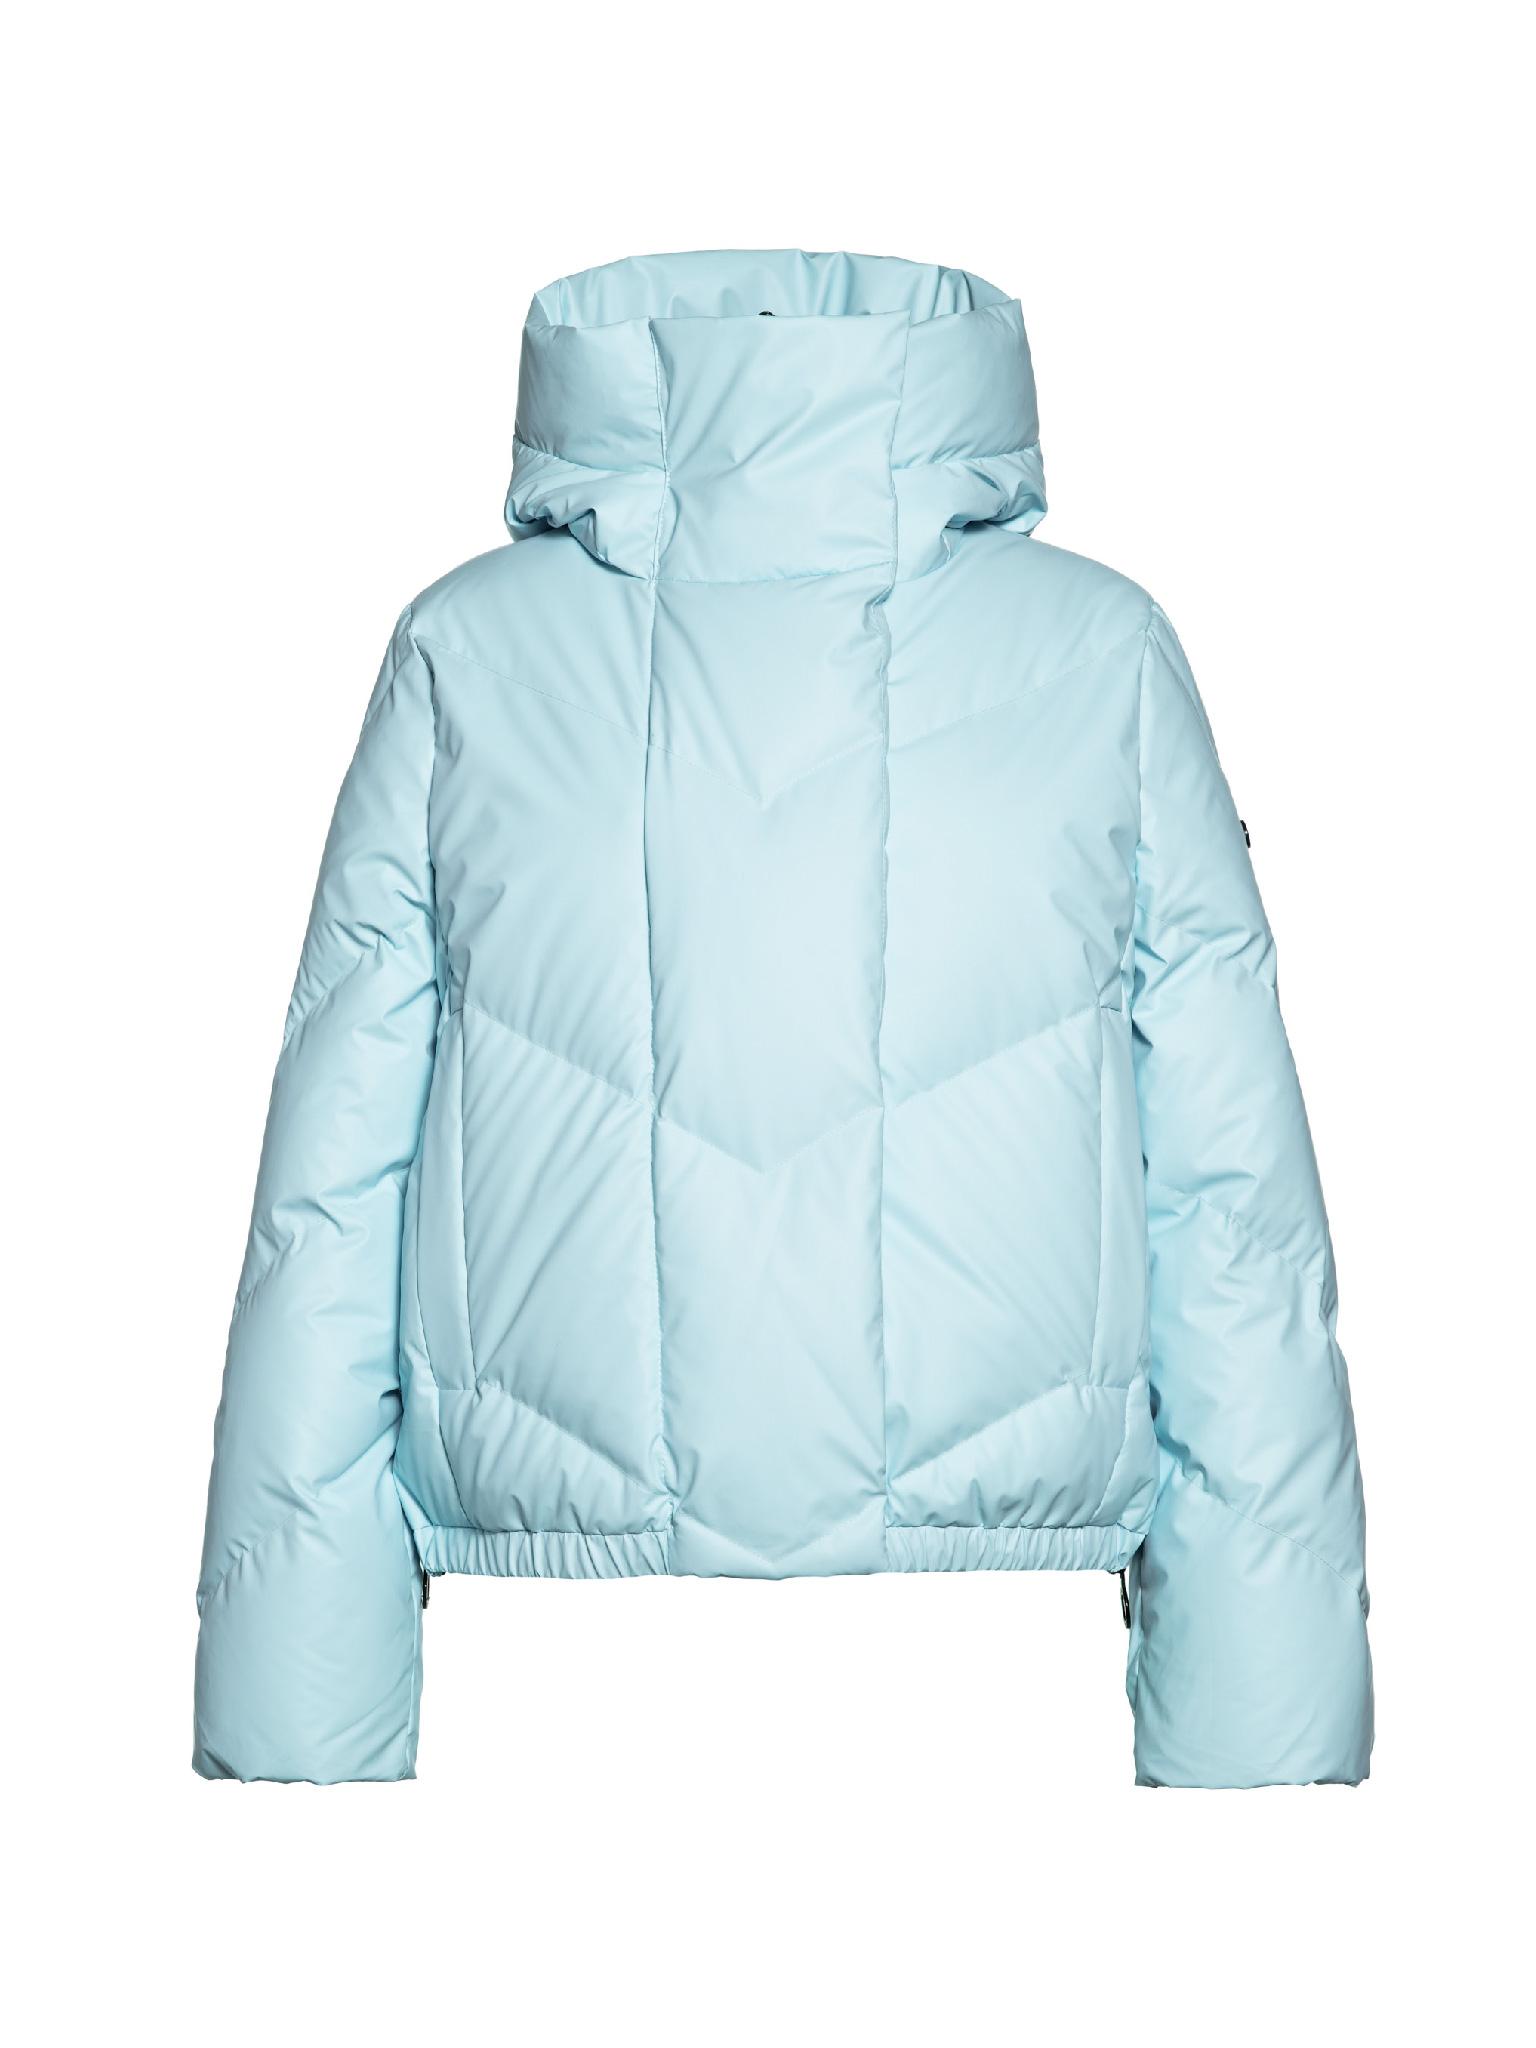 Goldbergh Cloud 9 Jacket 2022